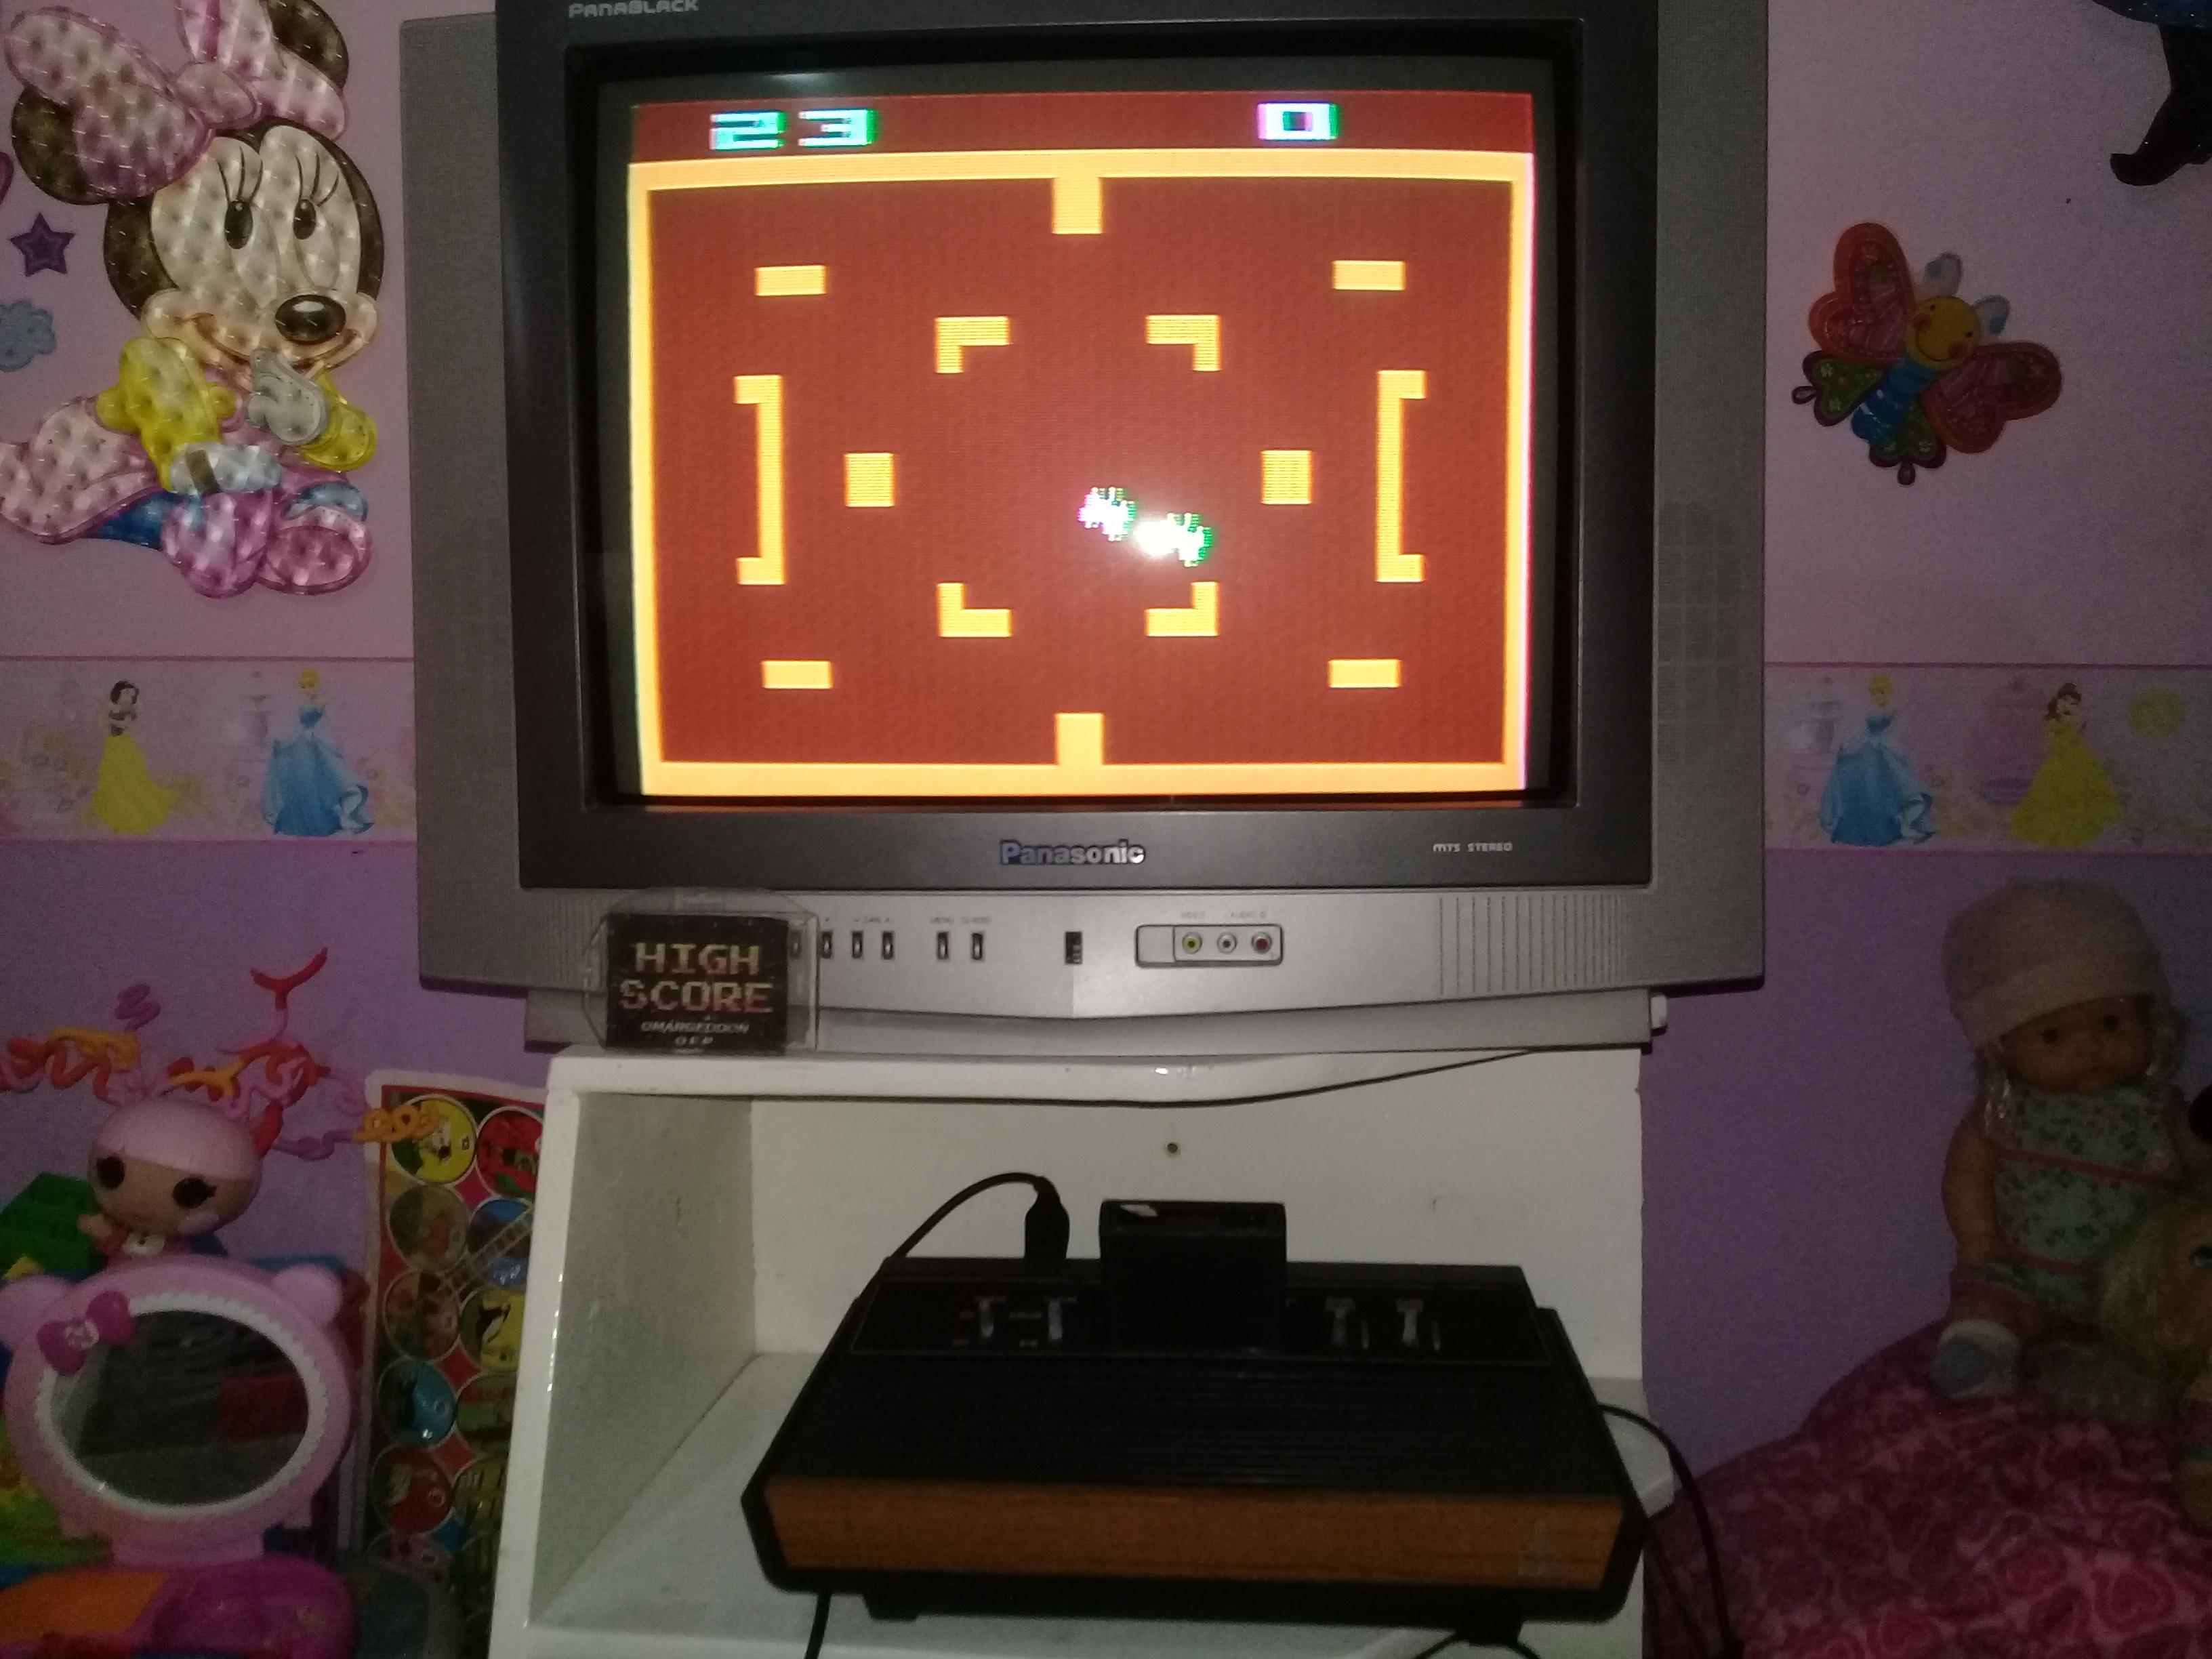 omargeddon: Combat: Game 7 (Atari 2600 Novice/B) 23 points on 2019-06-30 15:03:59